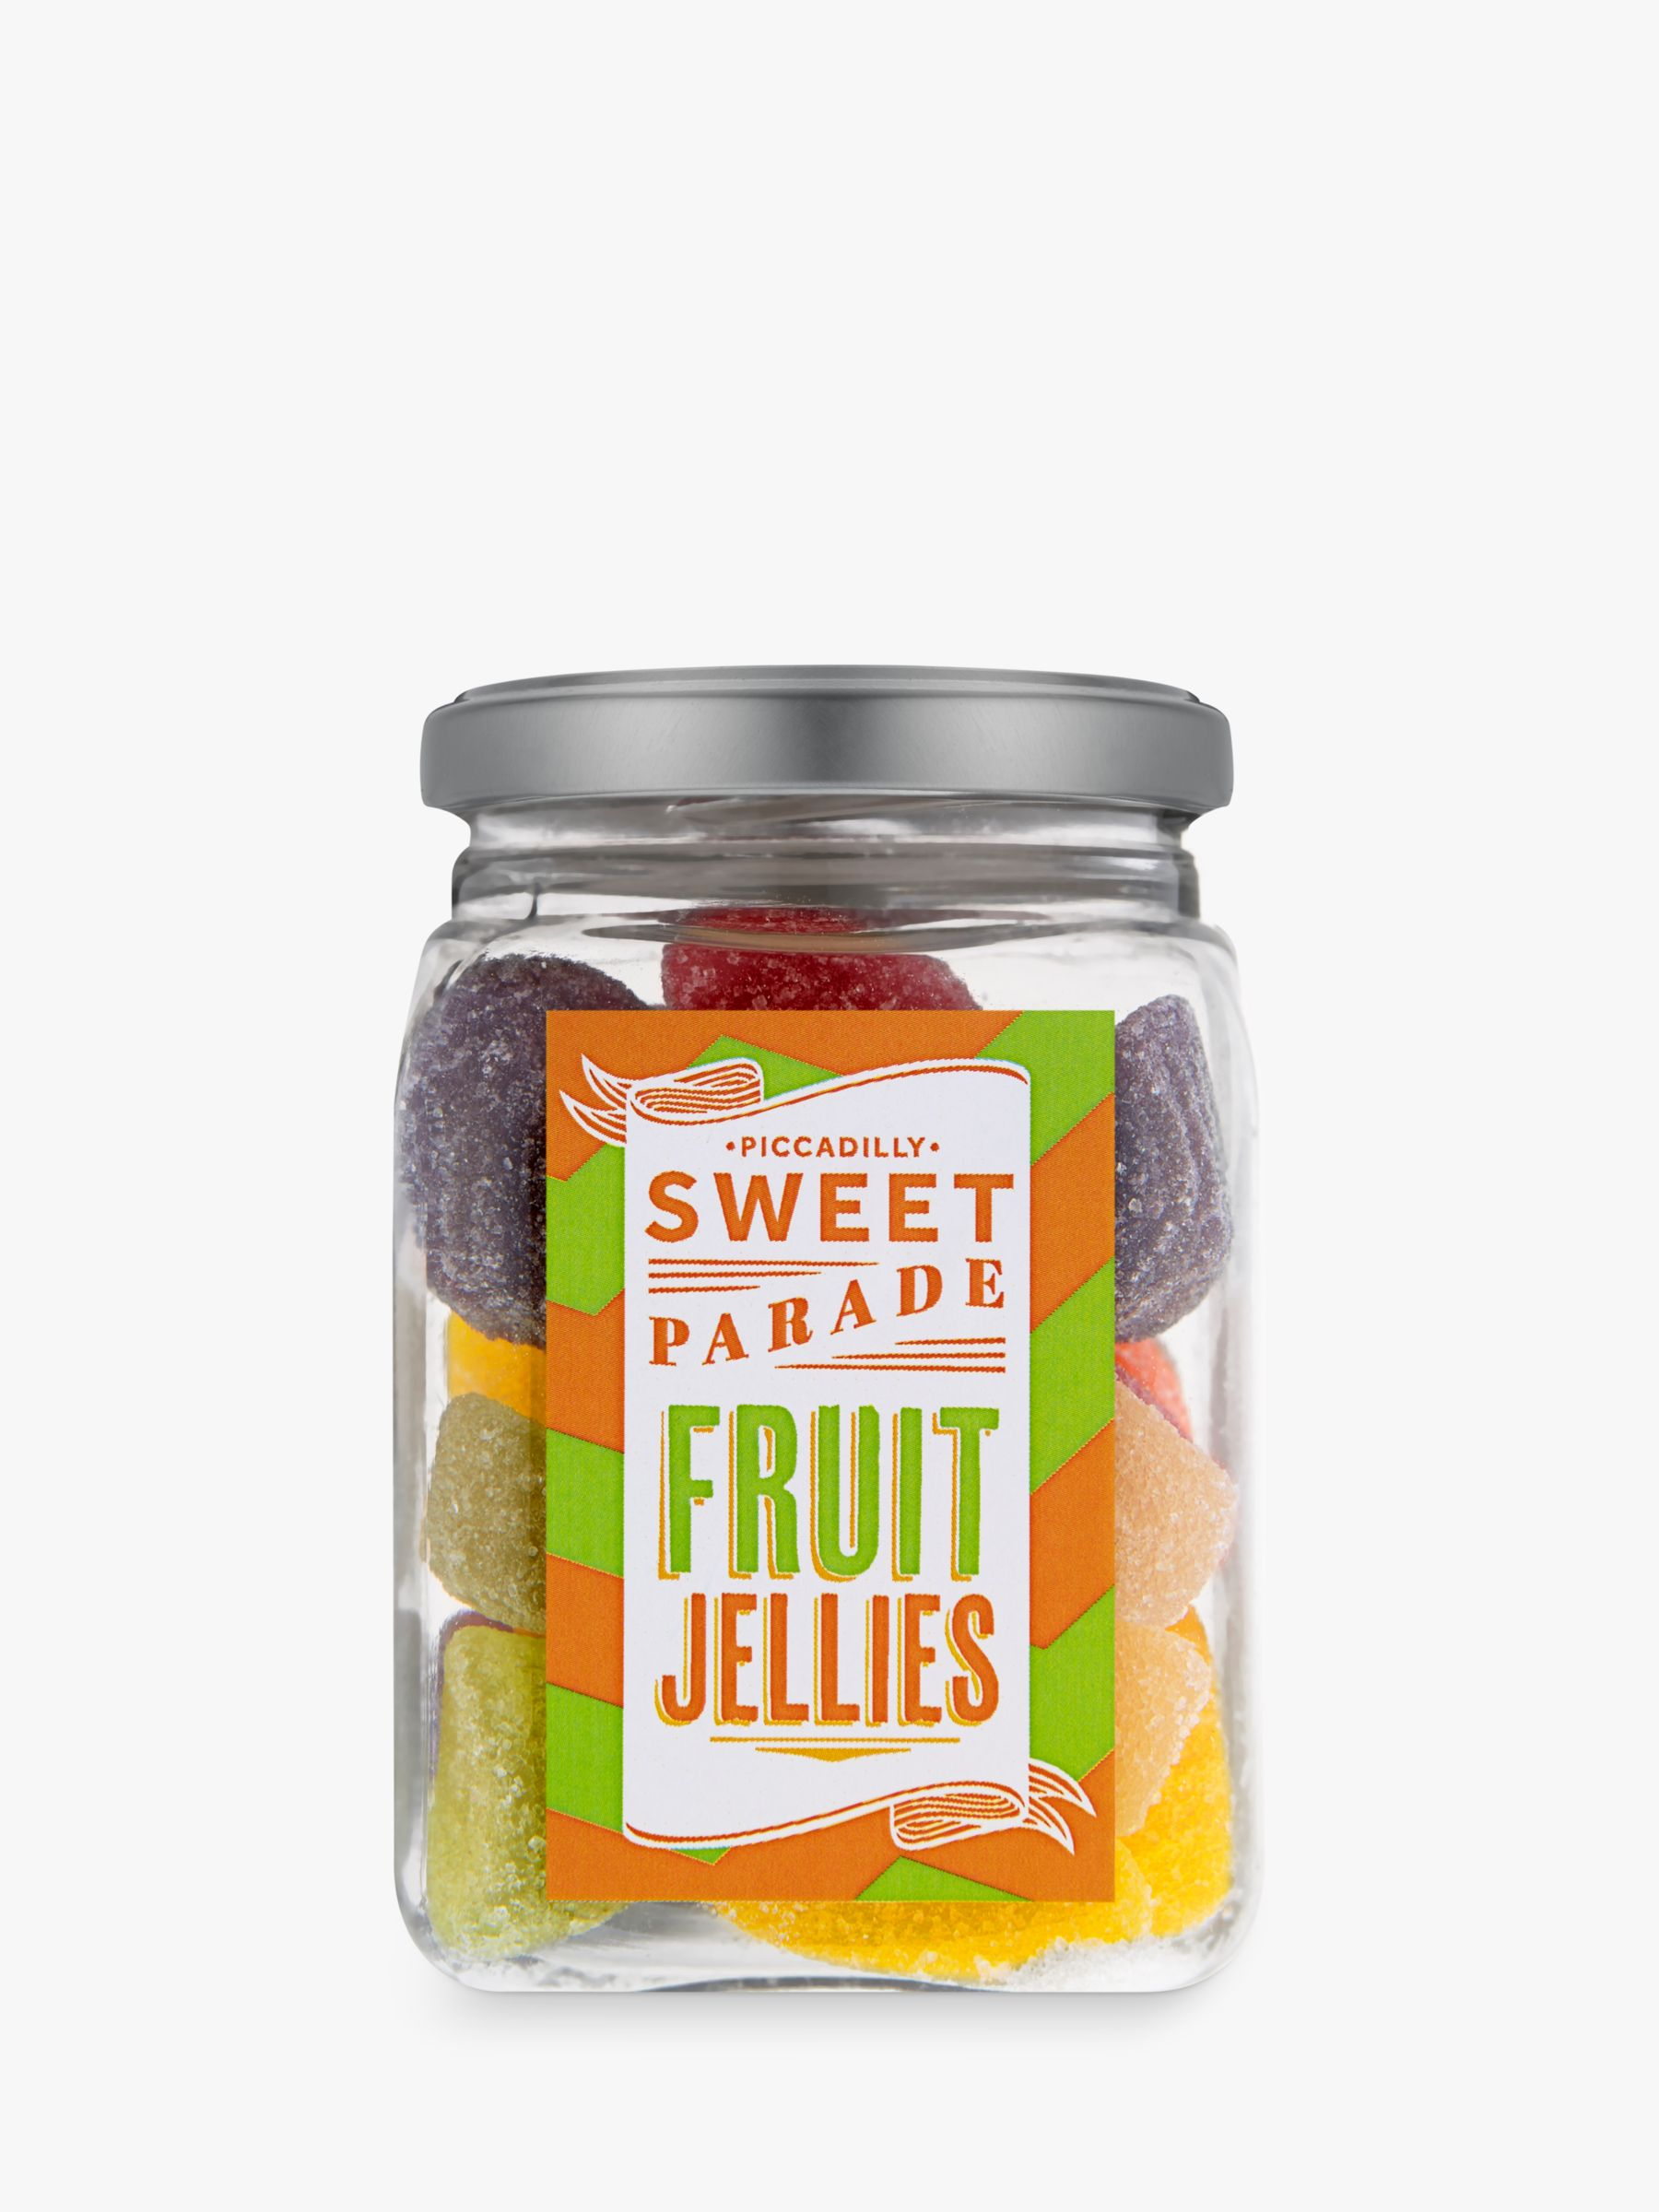 Piccadilly Sweet Parade Piccadilly Sweet Parade Fruit Jellies Jar, 200g